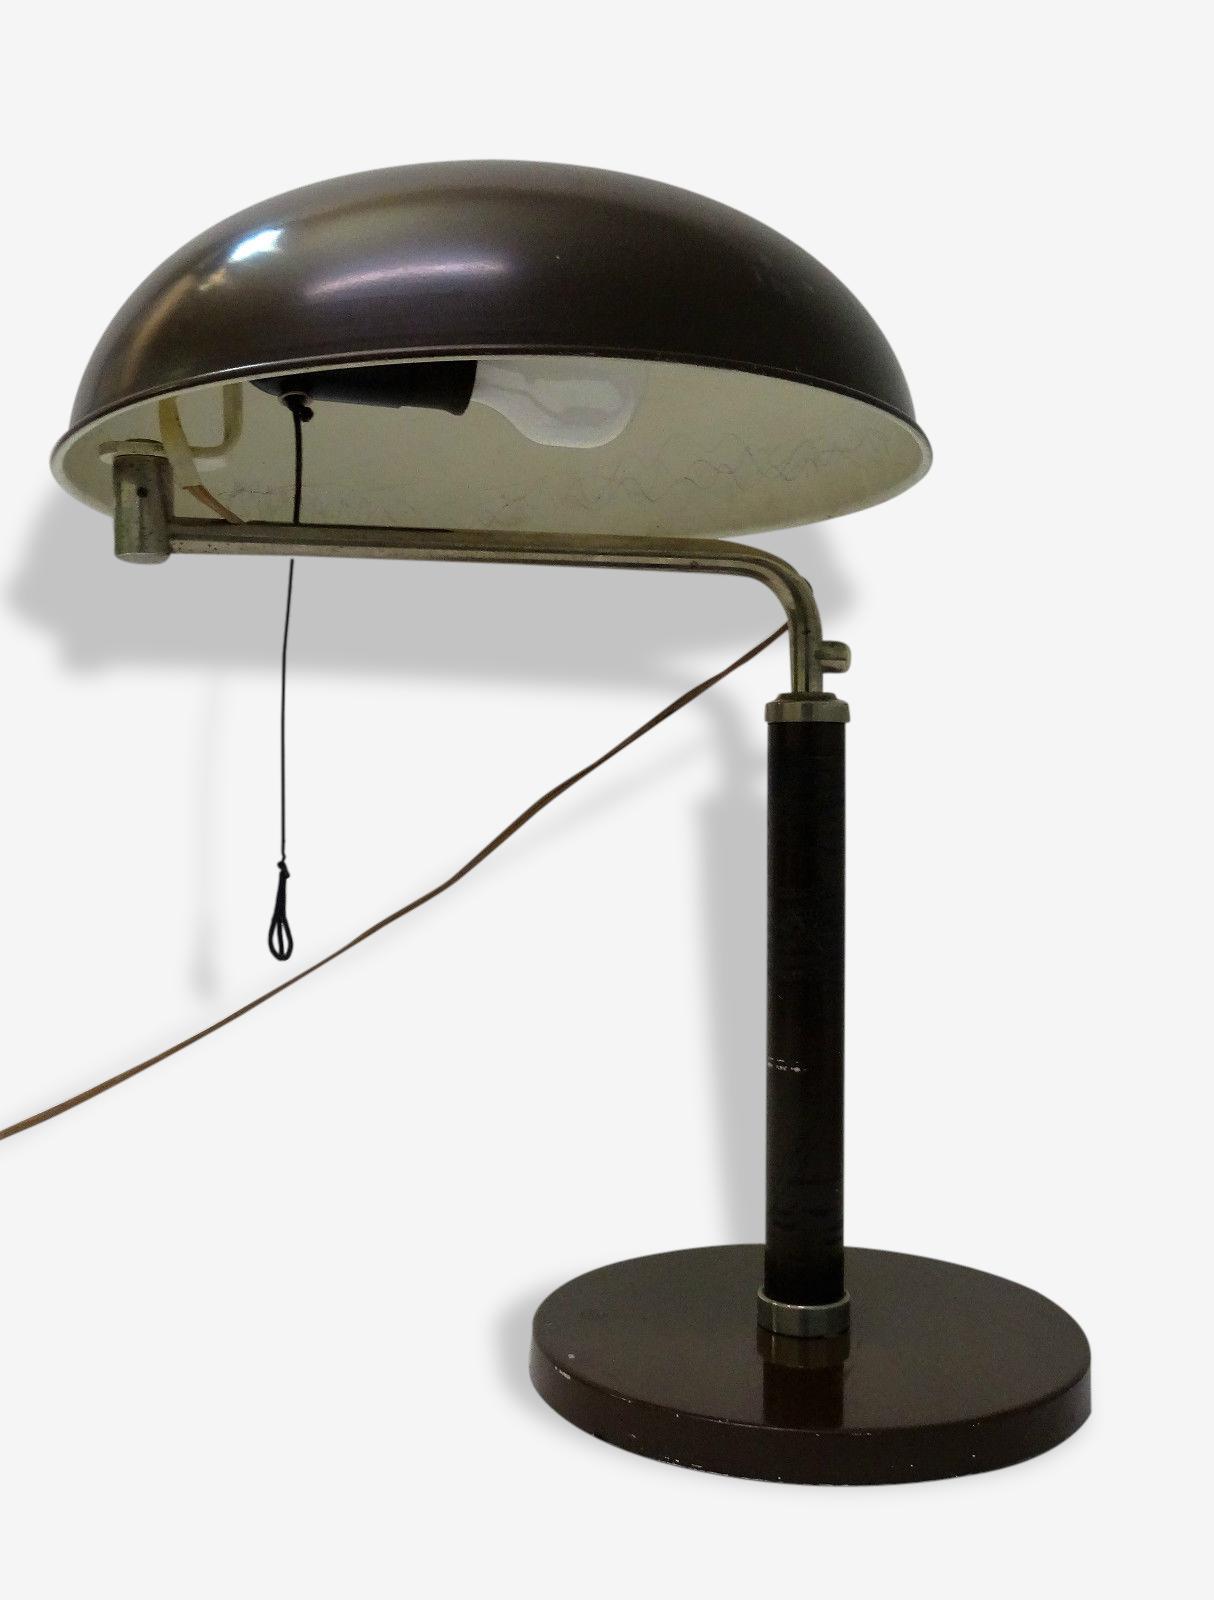 Alfred Muller Design Lampe Bureau Moderniste Quick 1500 Metal